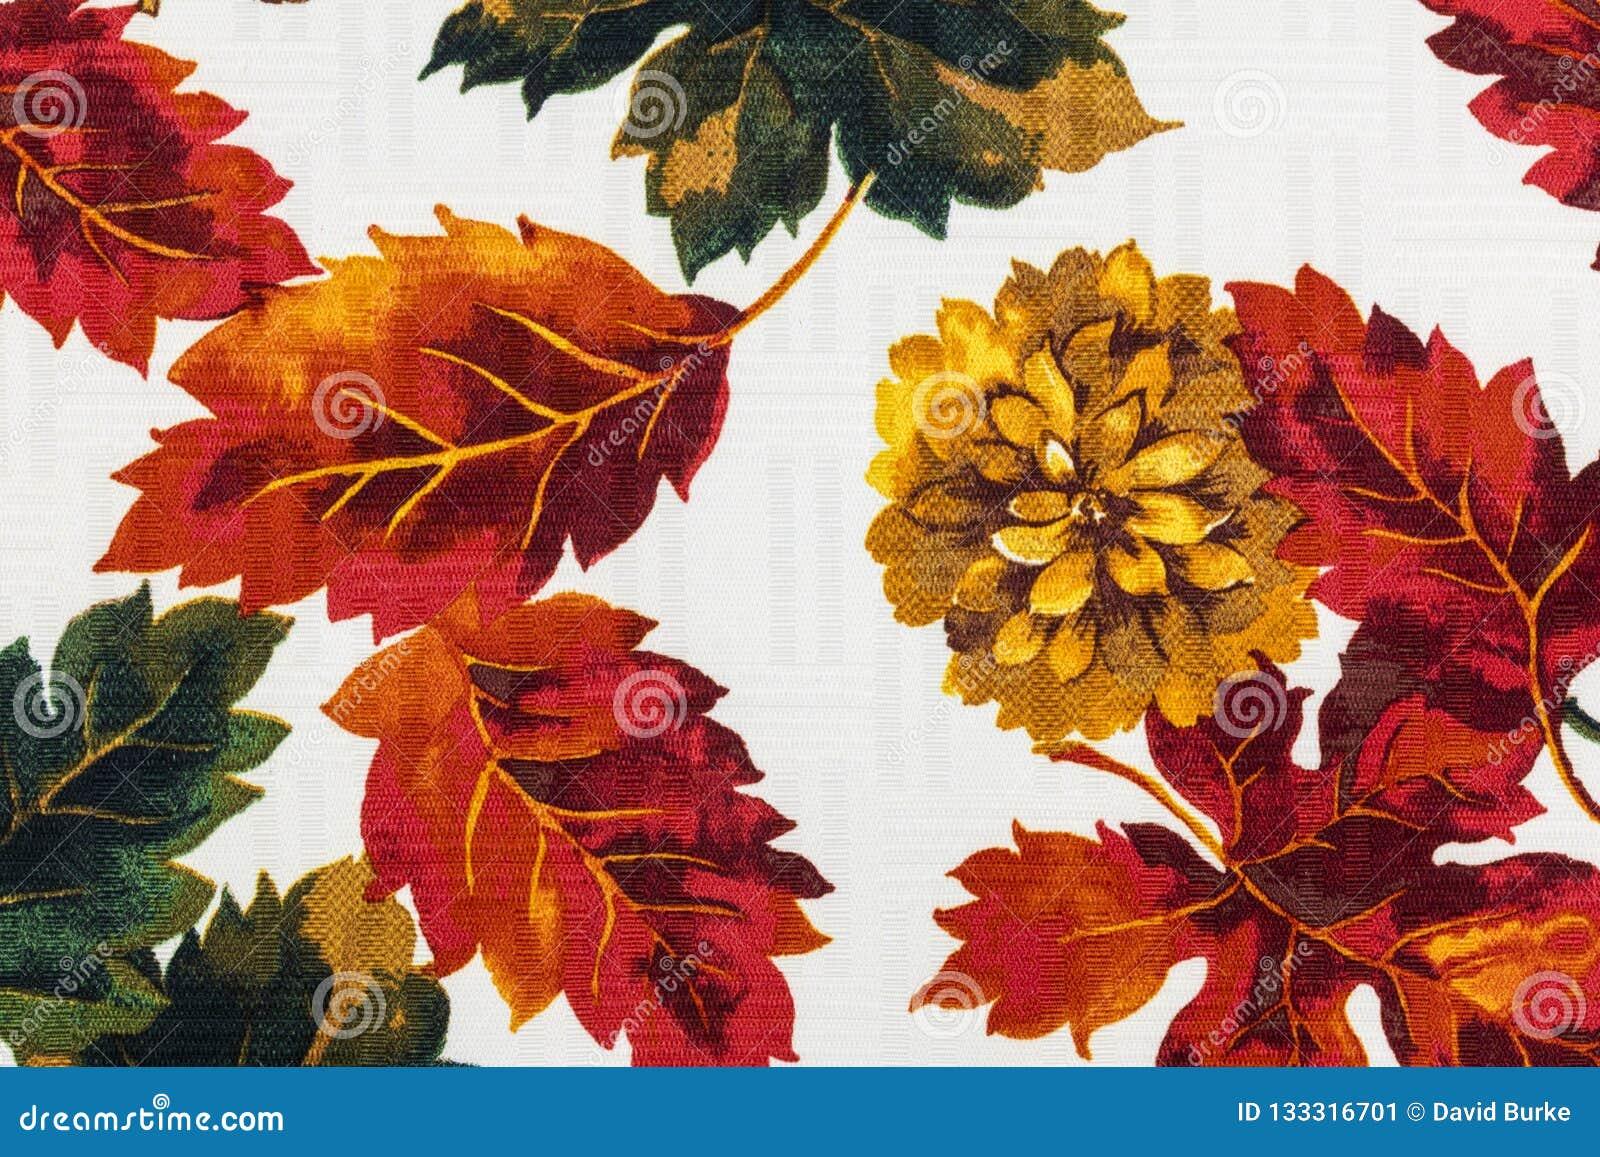 Autumn Leaves Thanksgiving Season Scenery Stock Image